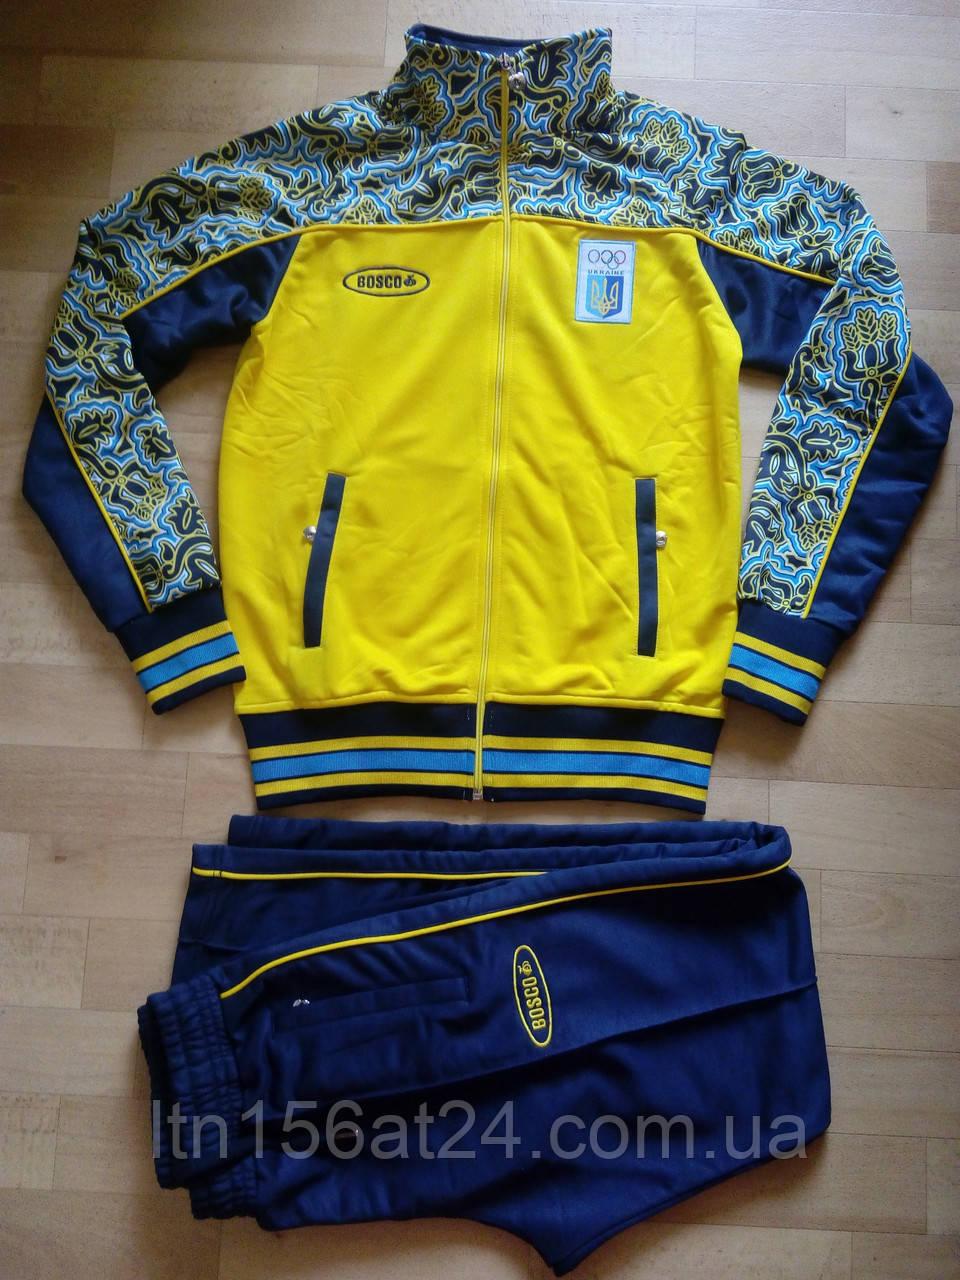 511304c5edb8 Спортивный костюм Bosco sport Ukraine. Боско спорт Украина оригинал ...